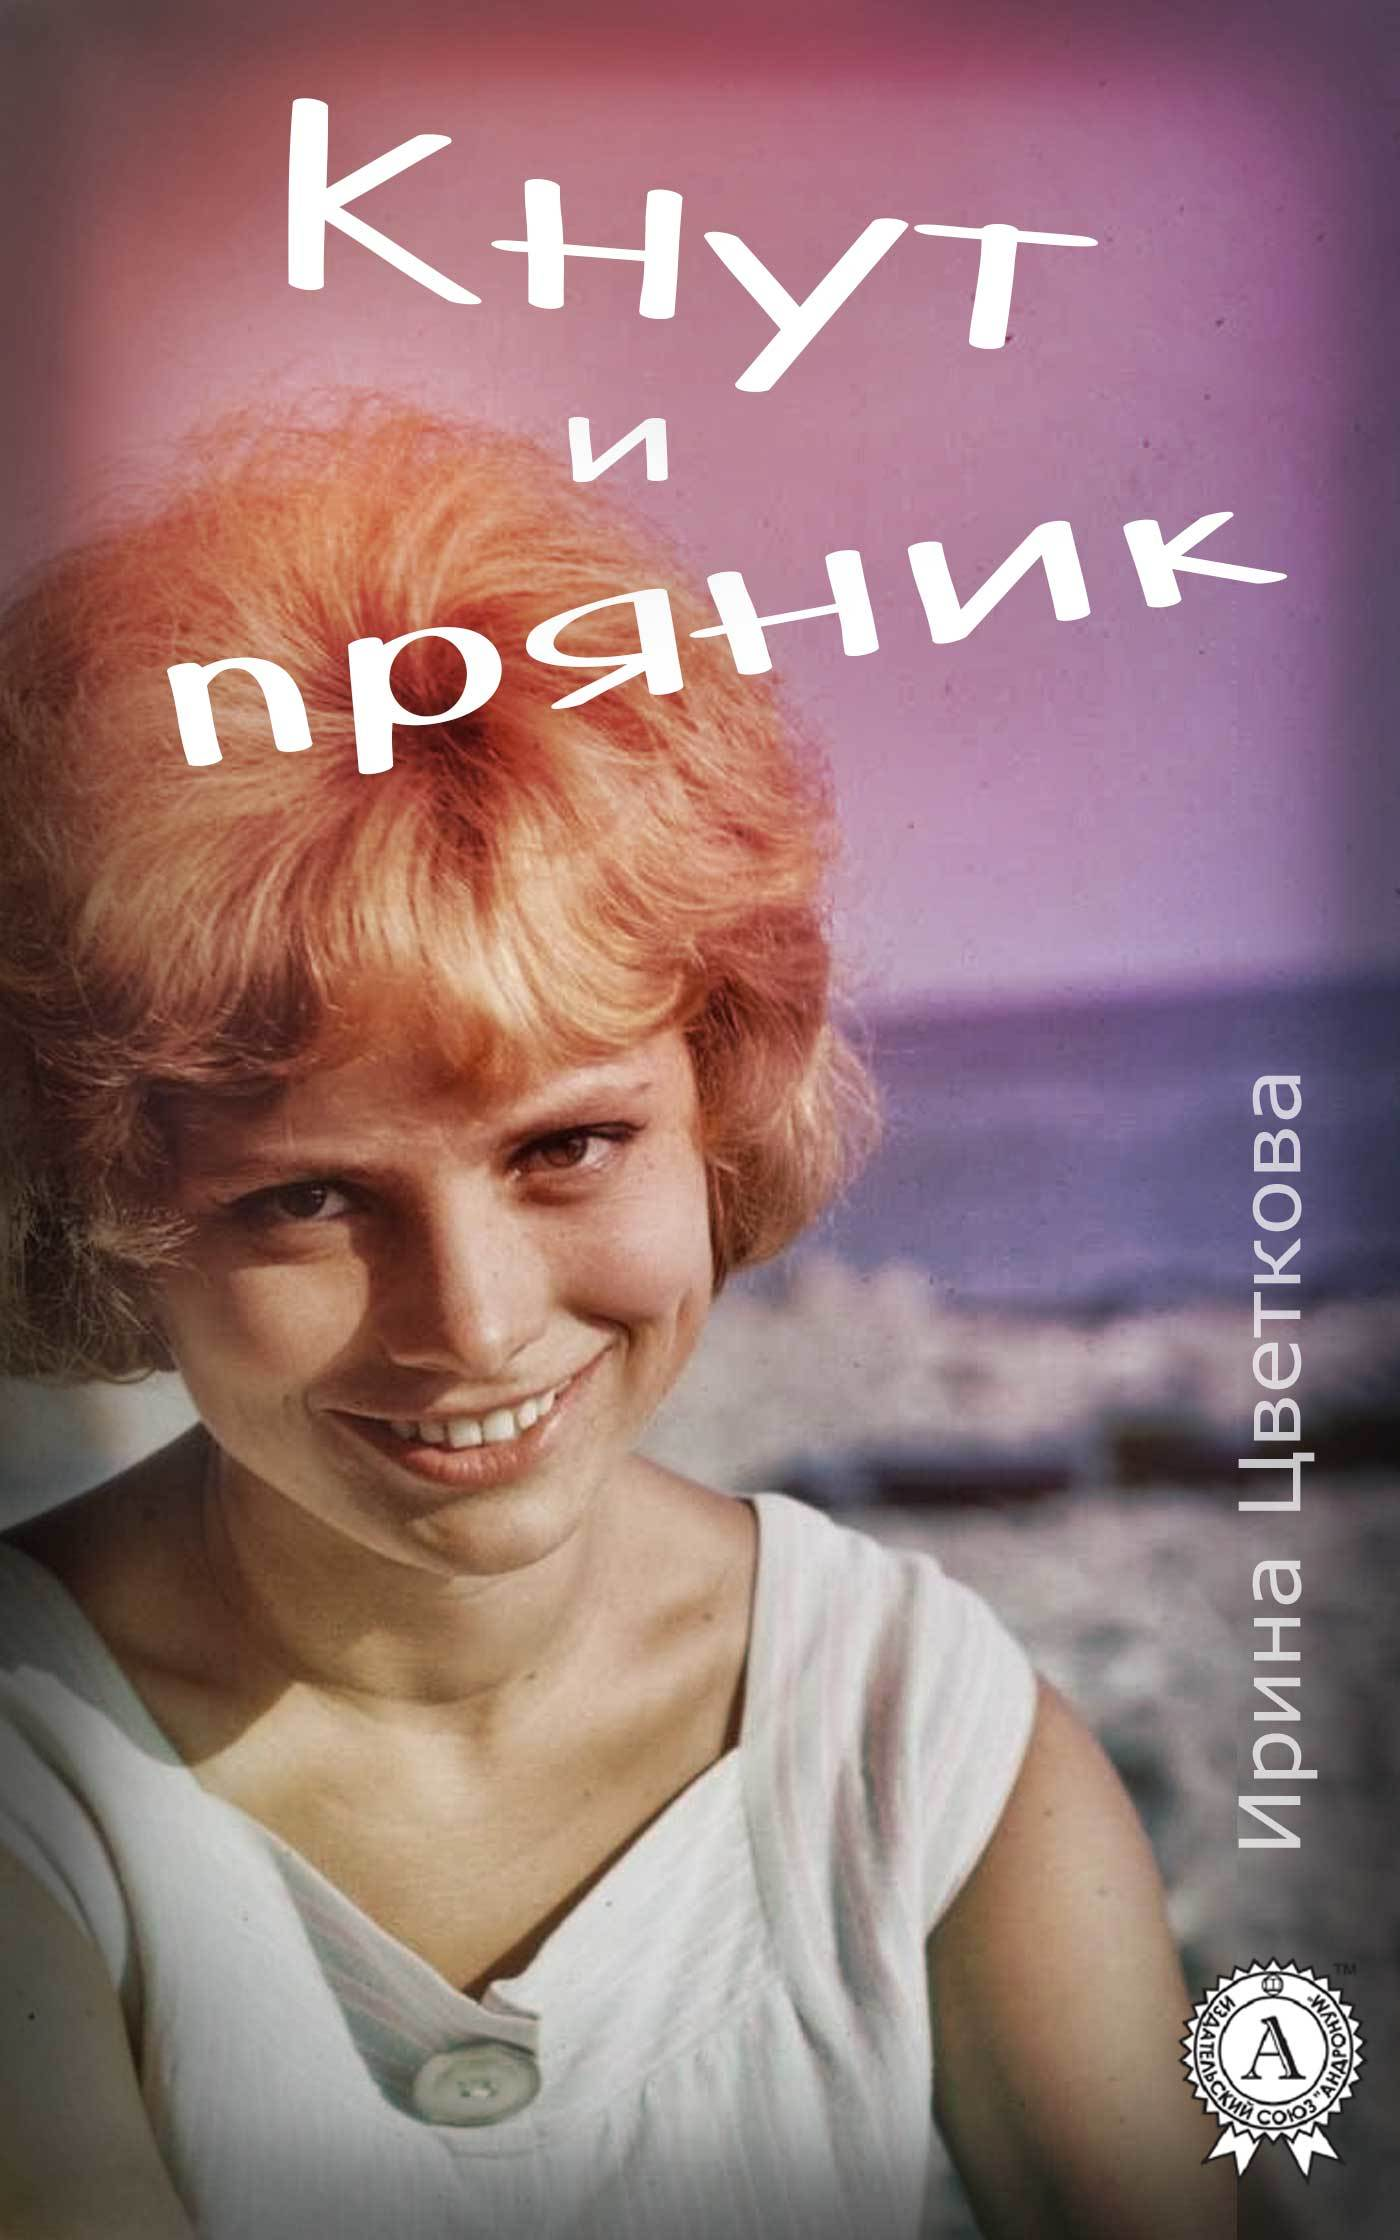 Шикарная заставка для романа 26/50/49/26504979.bin.dir/26504979.cover.jpg обложка